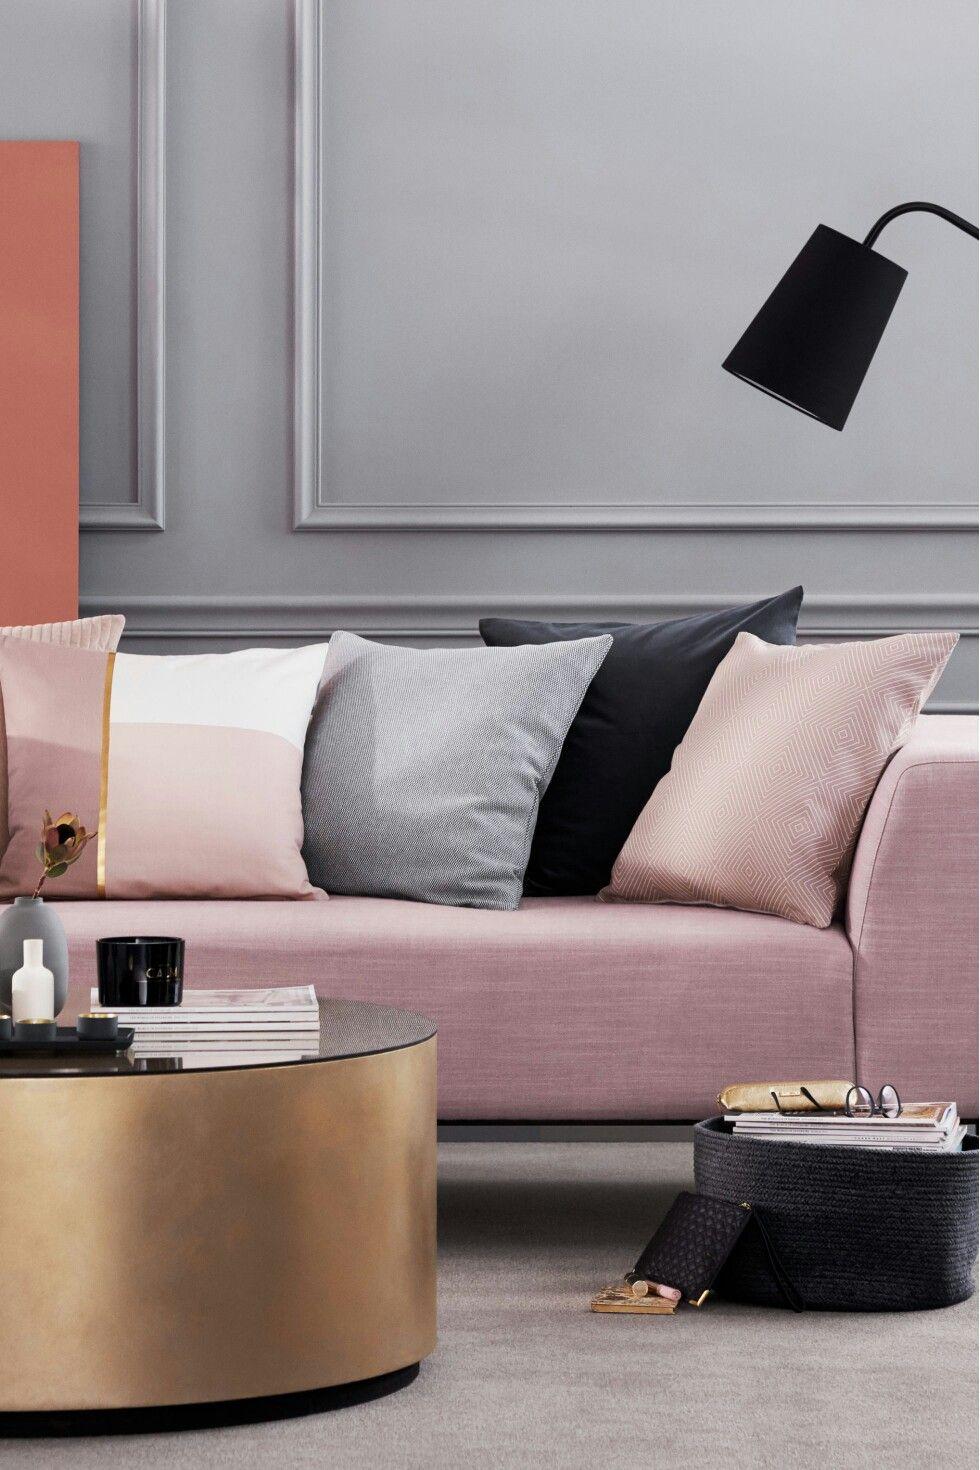 Pin by ania malinowska on pillows pinterest pillows